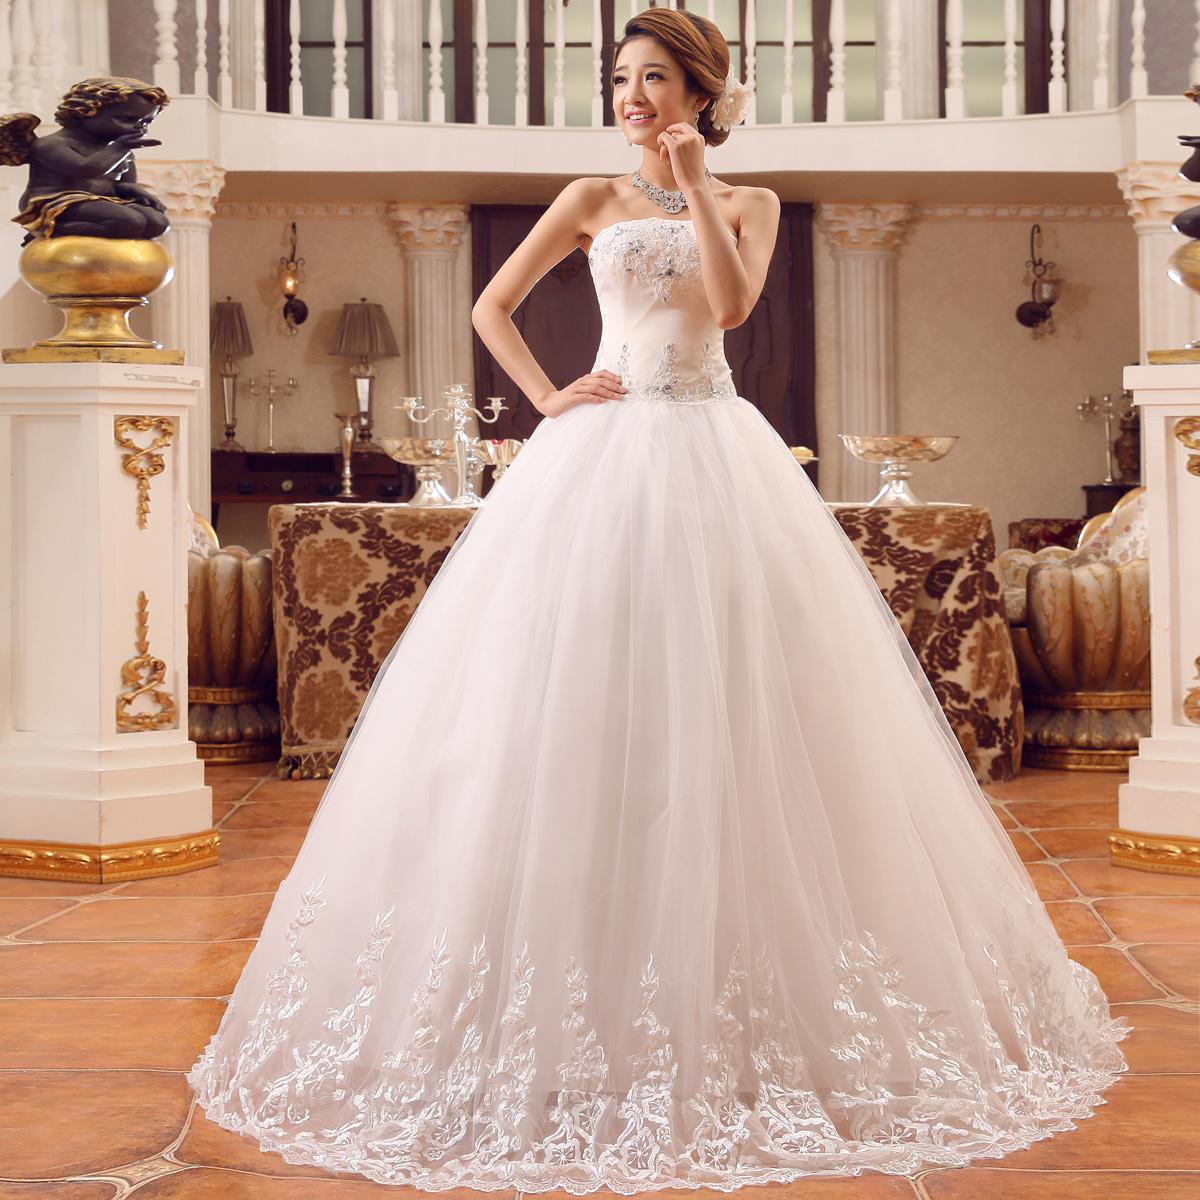 Princess Wedding Dress Big : Bow wedding dress big laciness princess formal